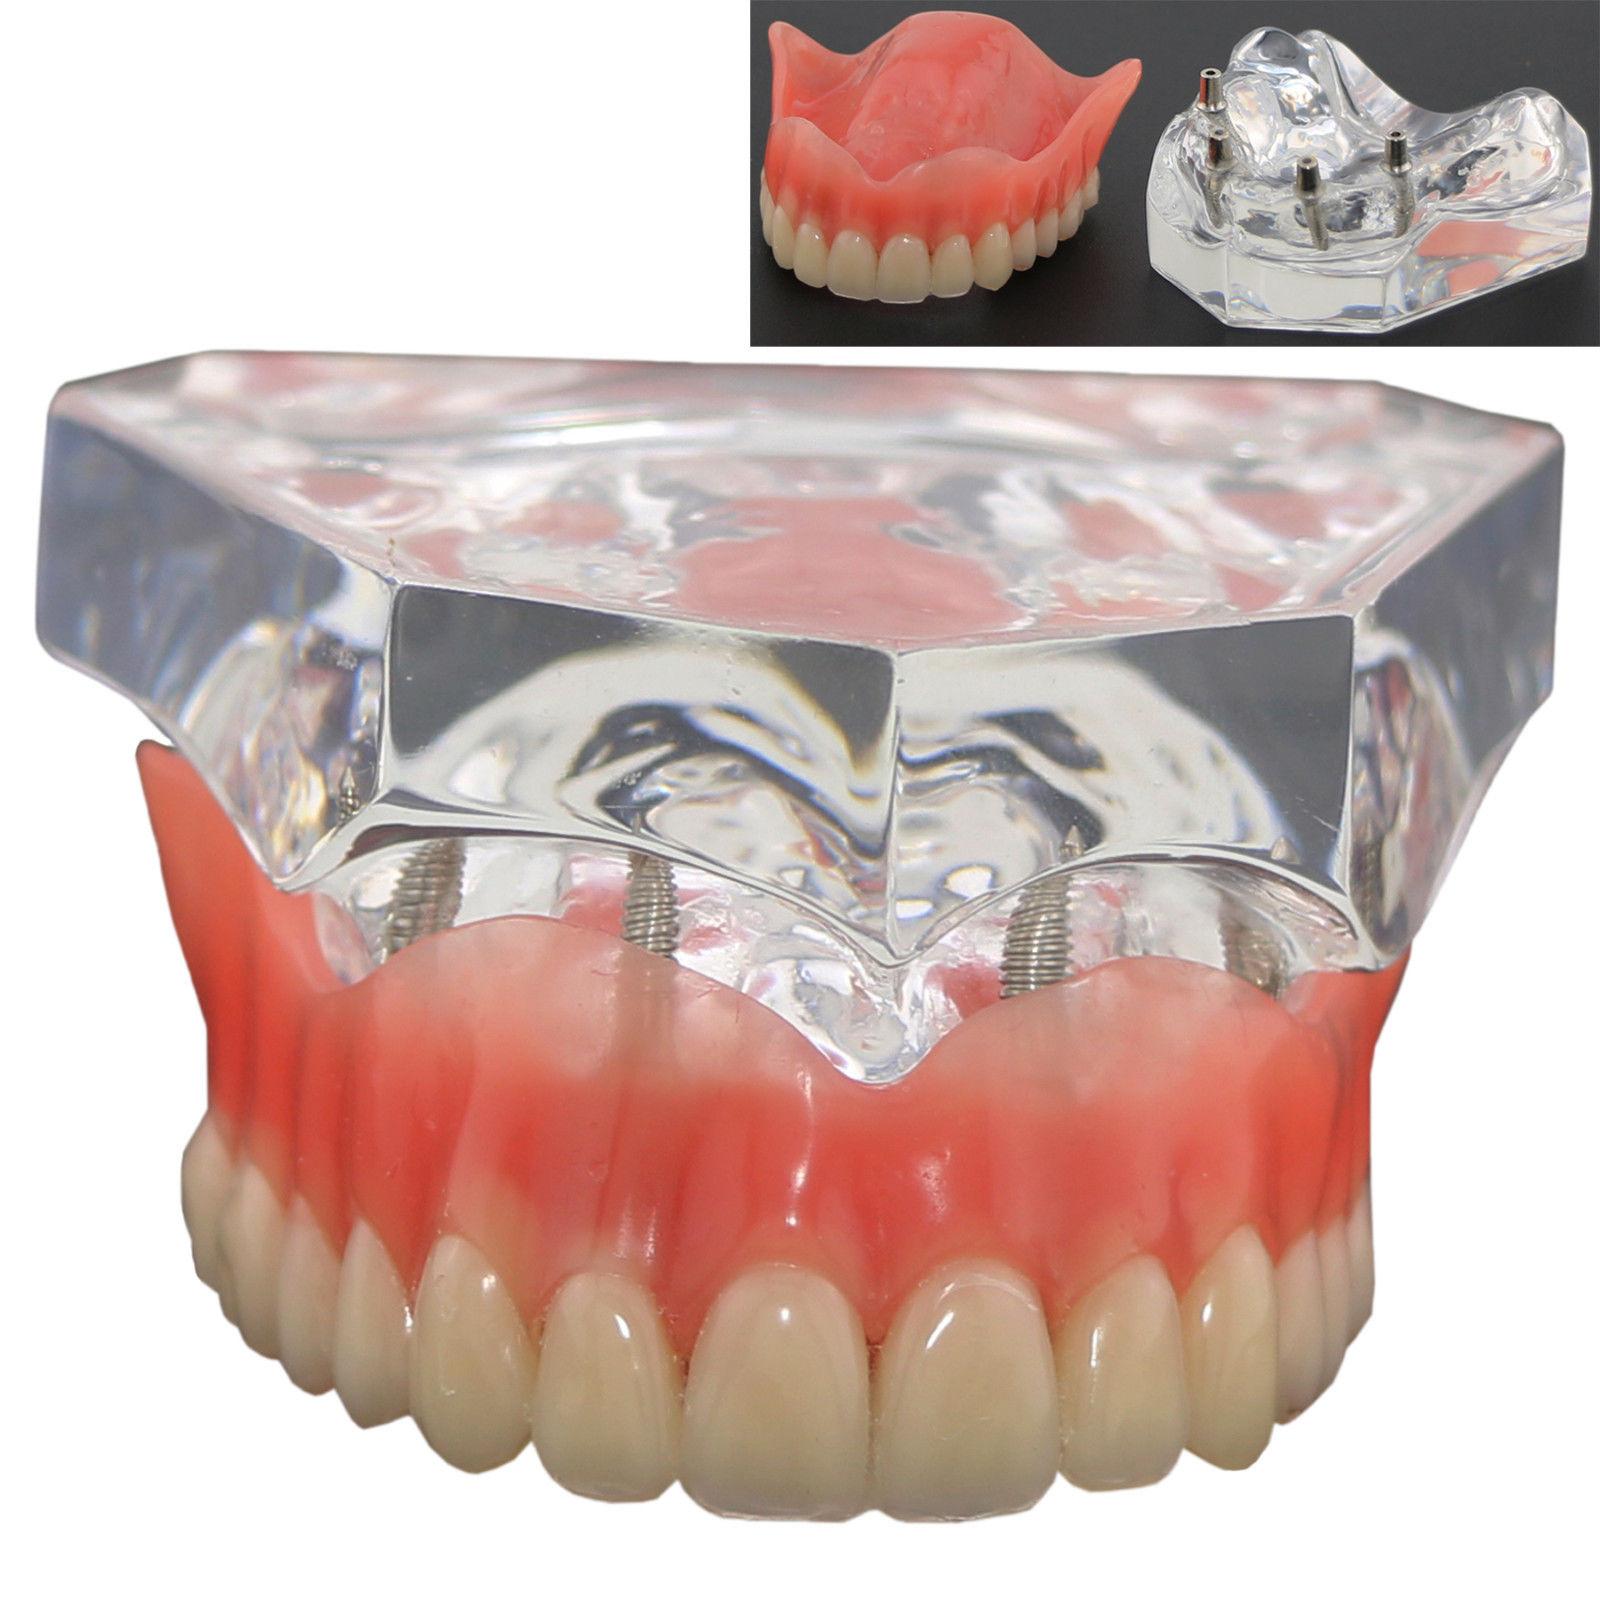 1pcs /pack Dental Upper Overdenture Superior 4 Implants Demo Model 6001 02 Teeth Model